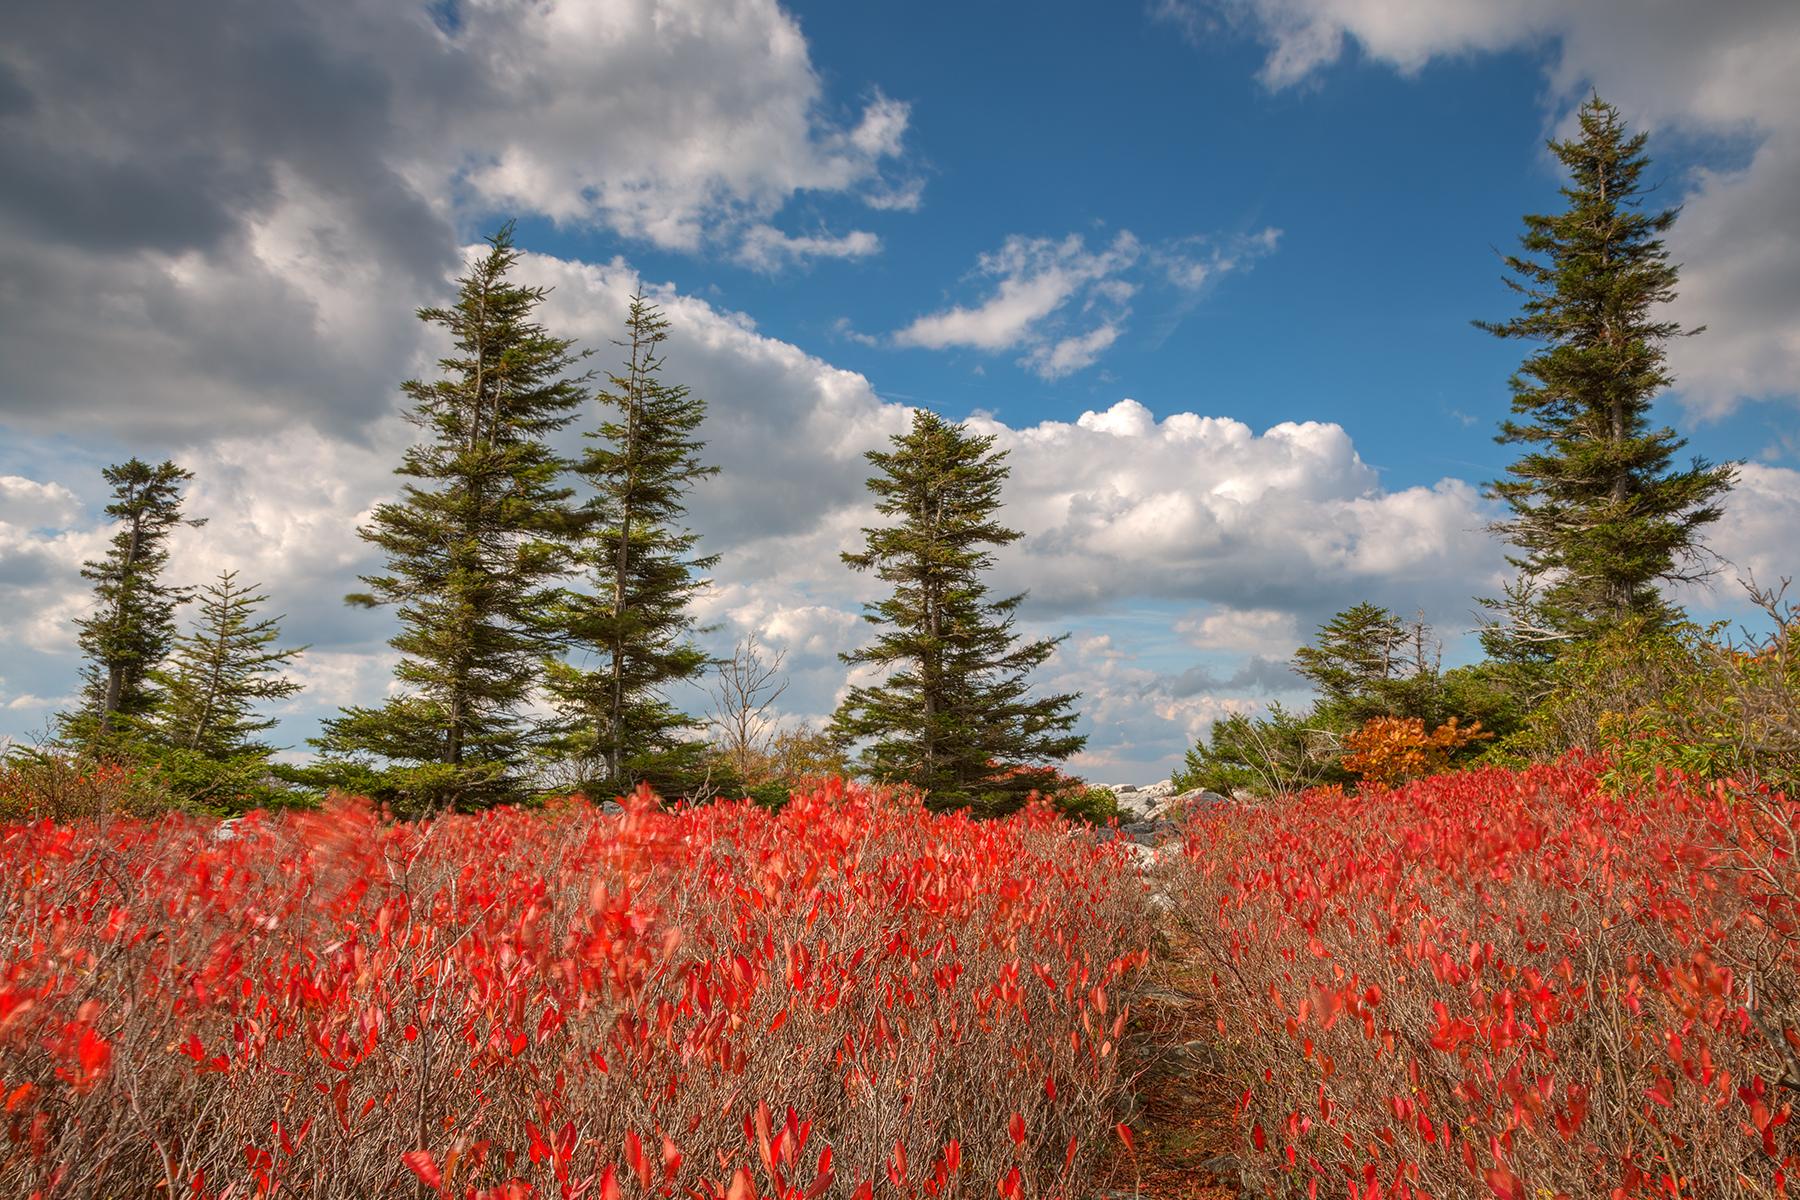 Autumn Huckleberry Wonderland - HDR, , Perspective, Scene, Rocky, HQ Photo